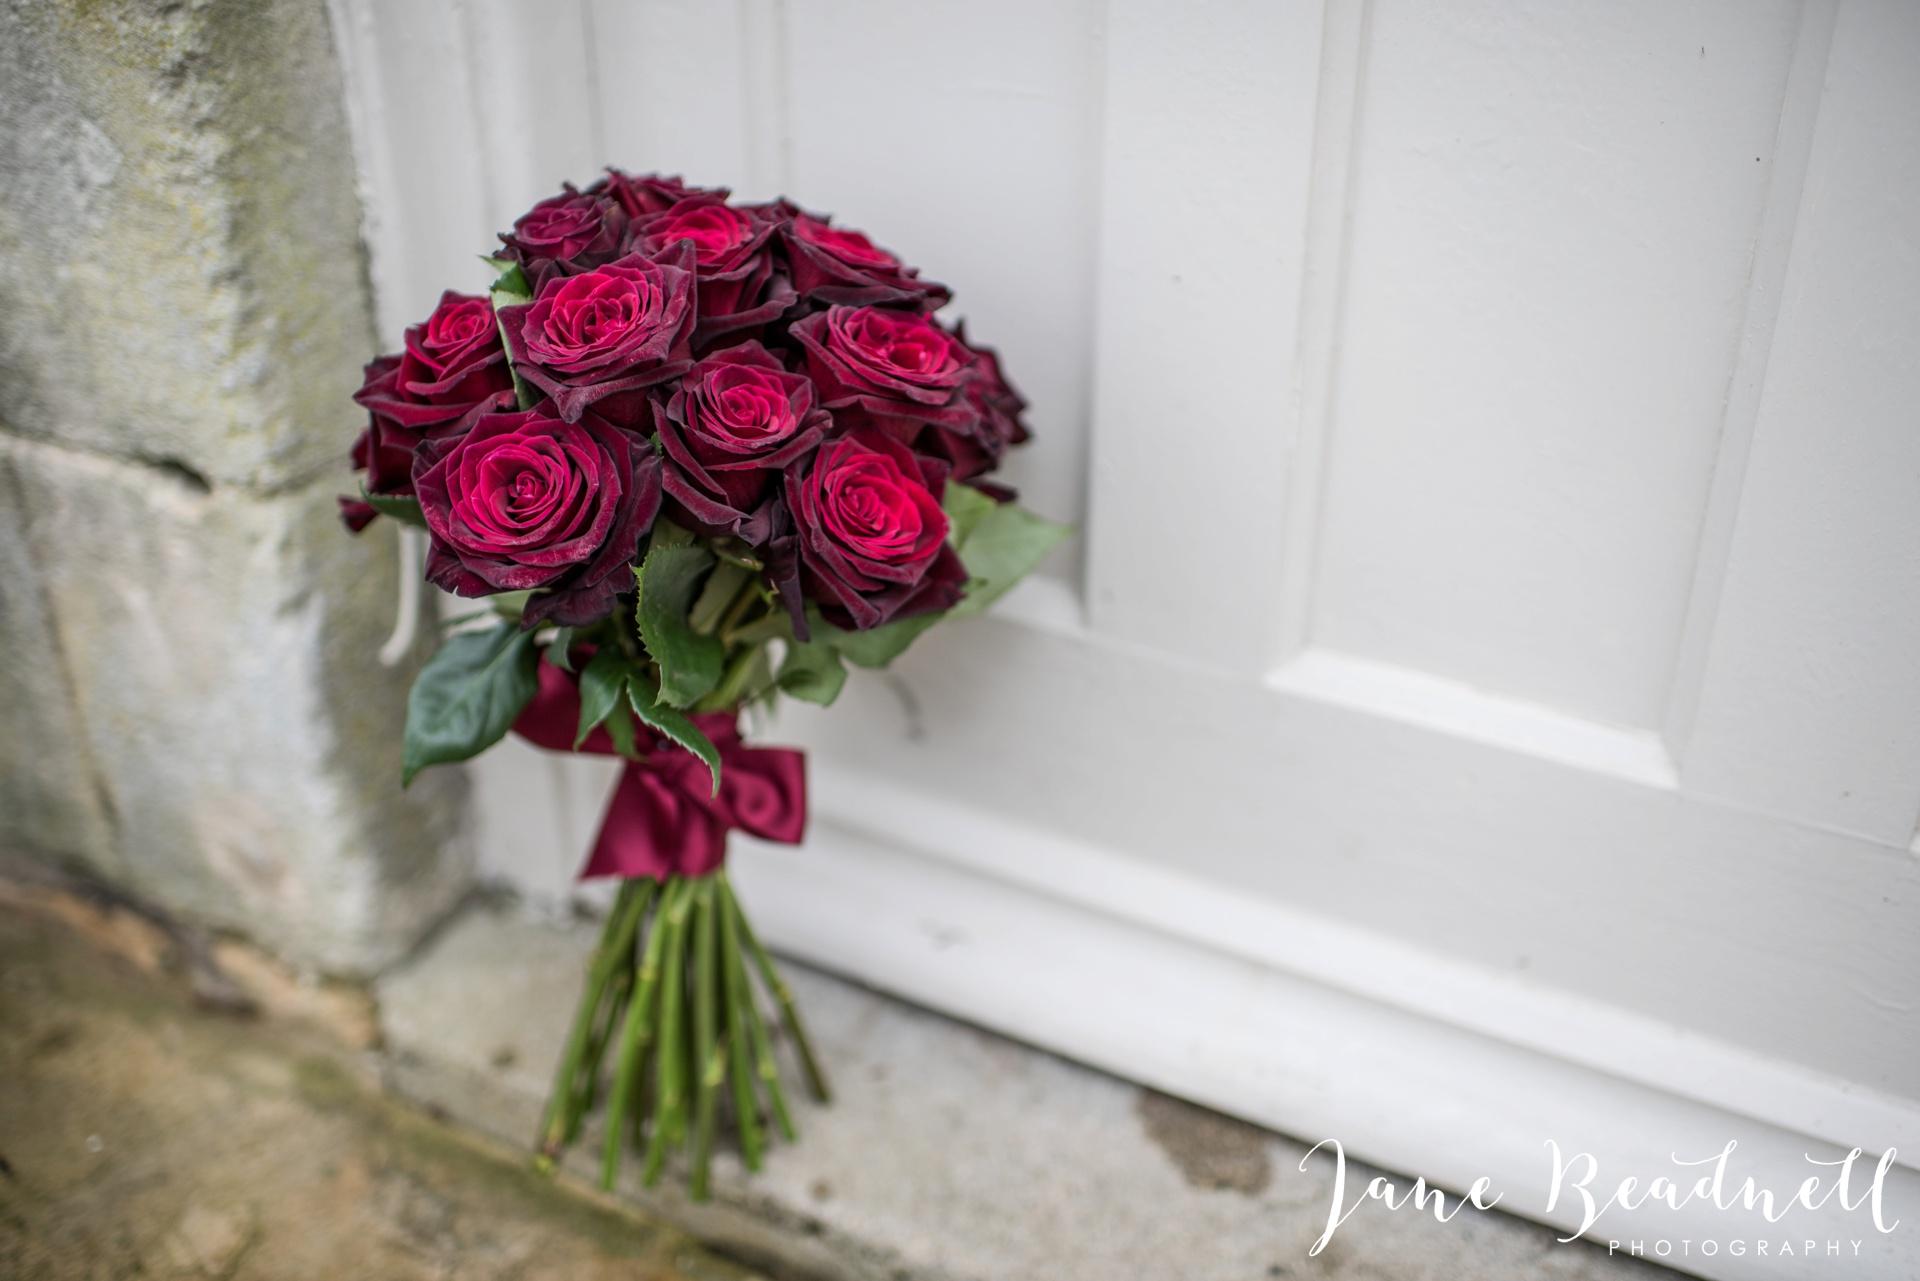 The Kingcote Barn Bristol Yorkshire and destination wedding photographer Jane Beadnell Photography_0006